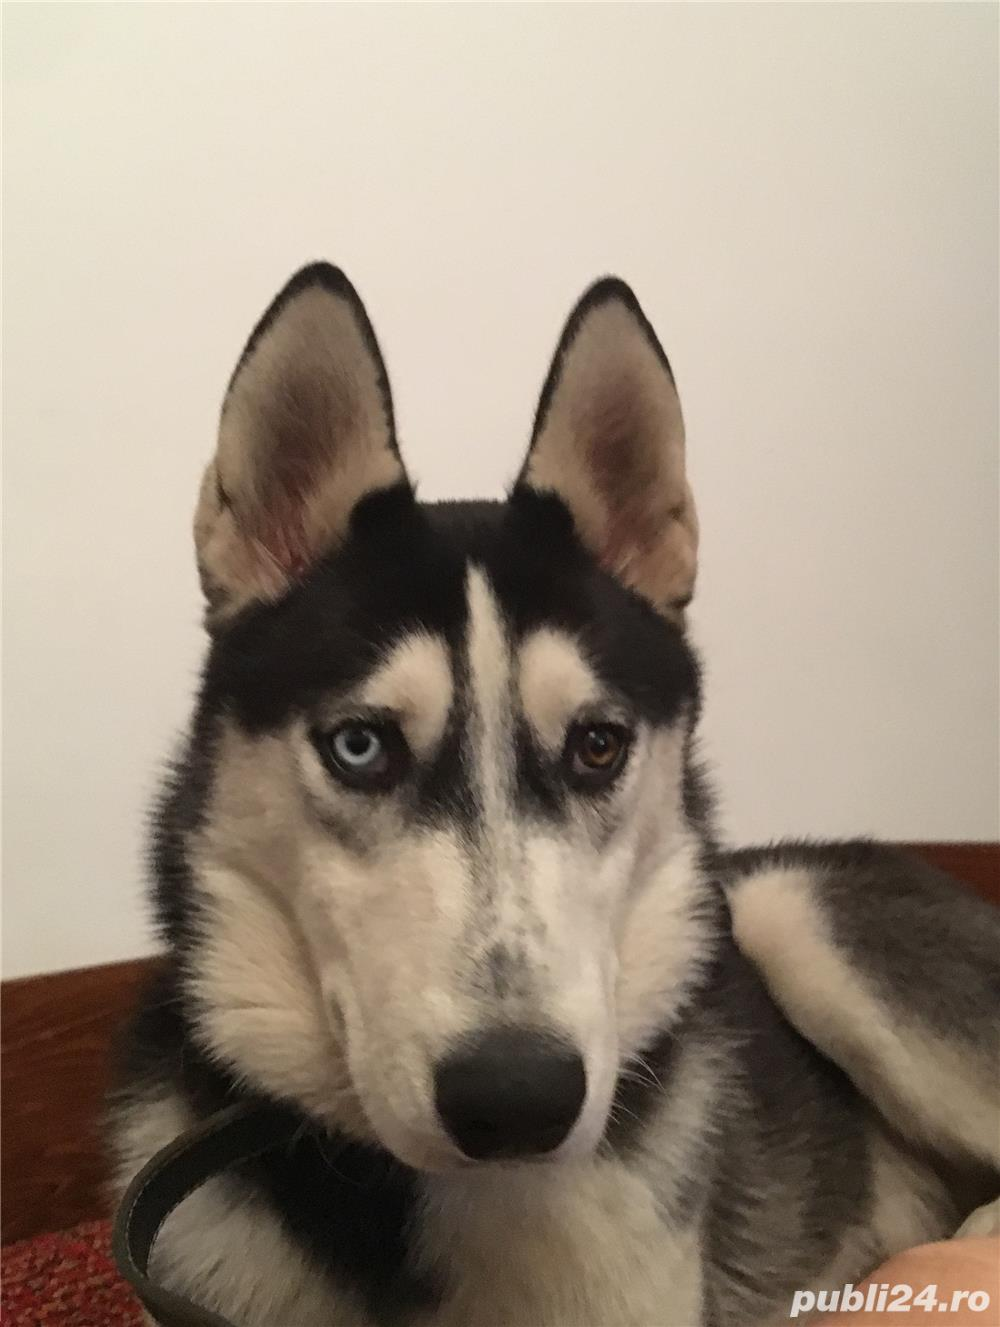 ofer pentu monta (împerechere) mascul Husky